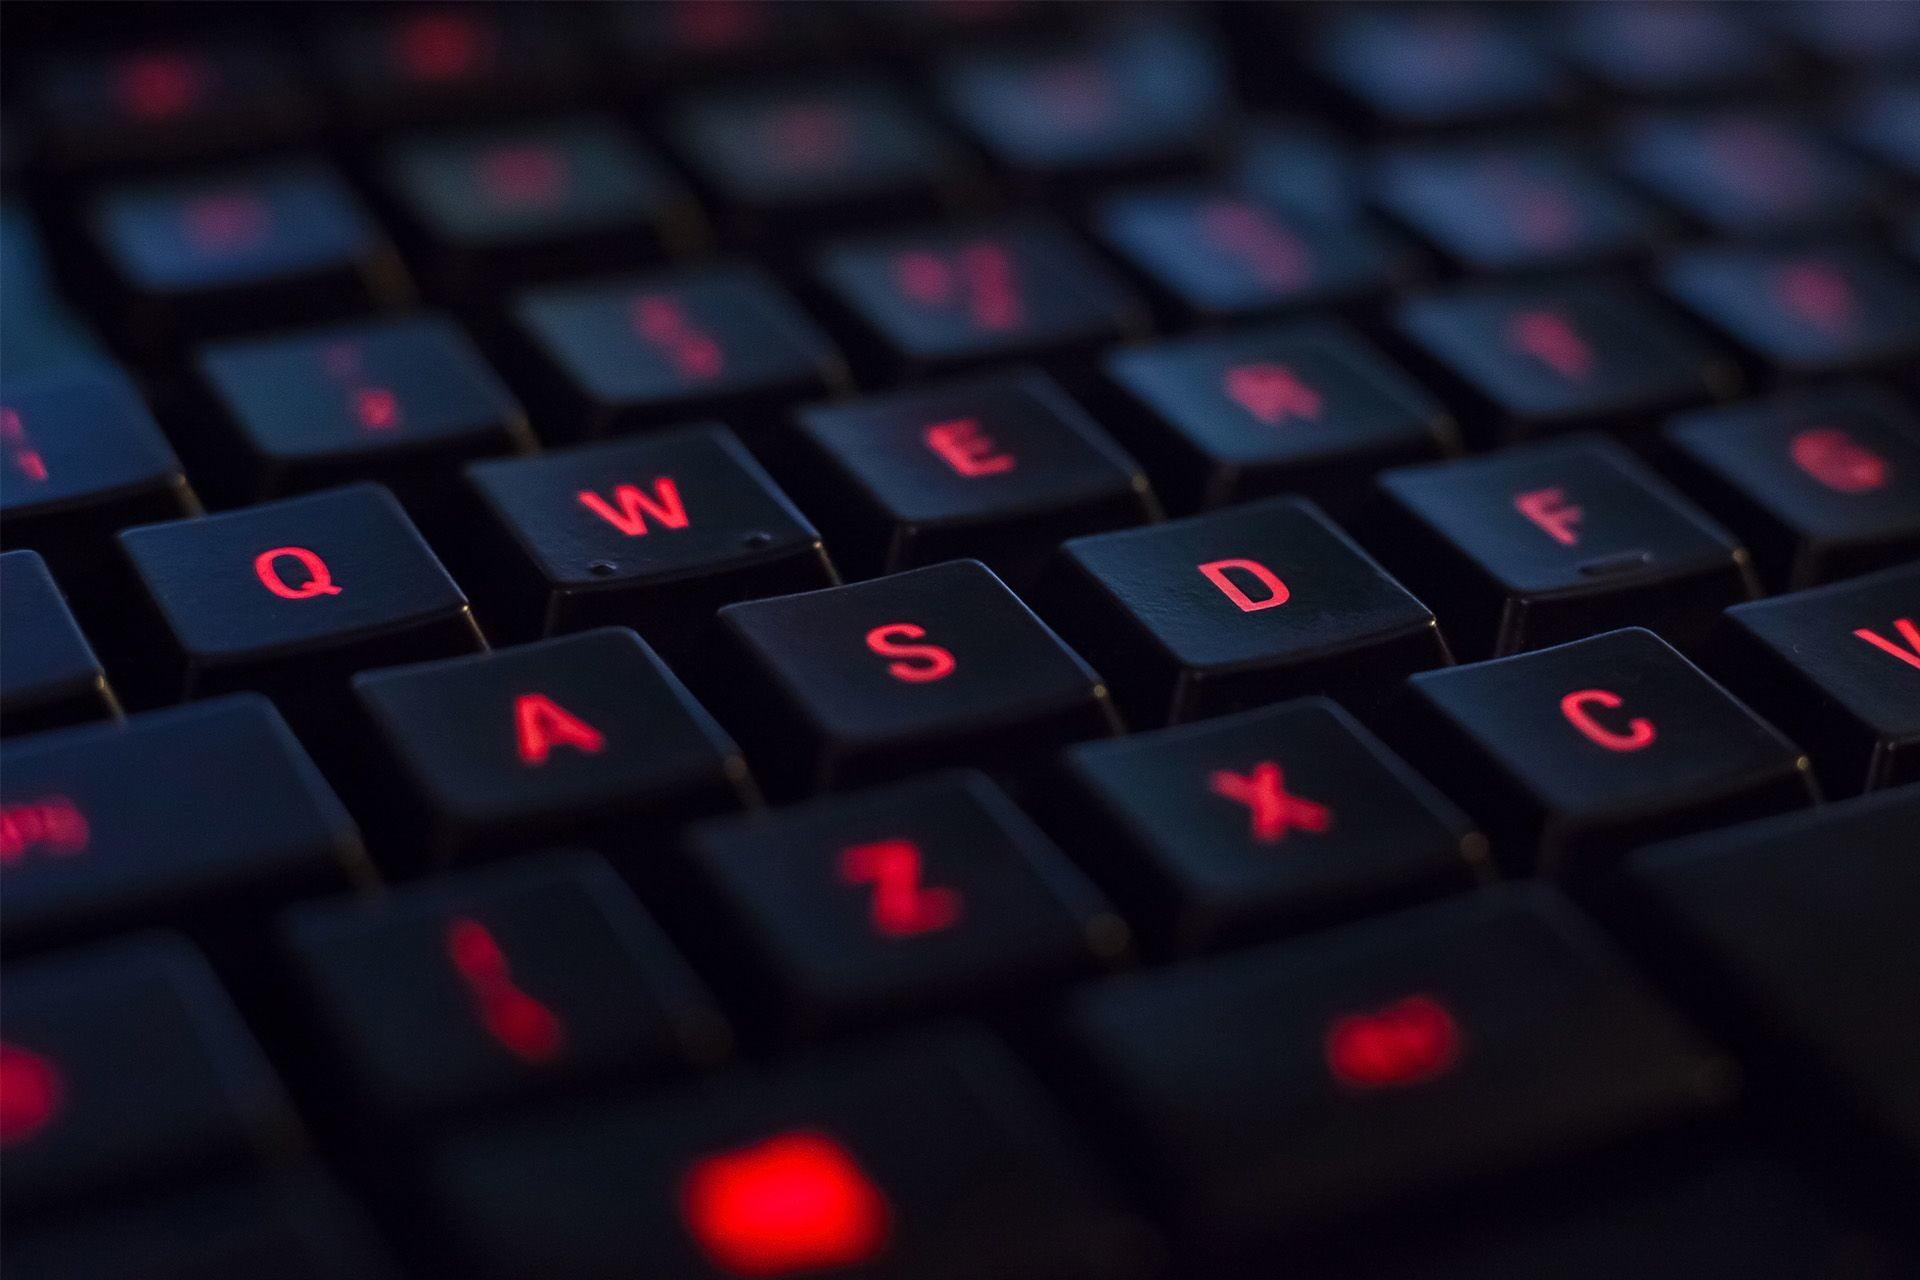 Как поменять назначение клавиш на клавиатуре